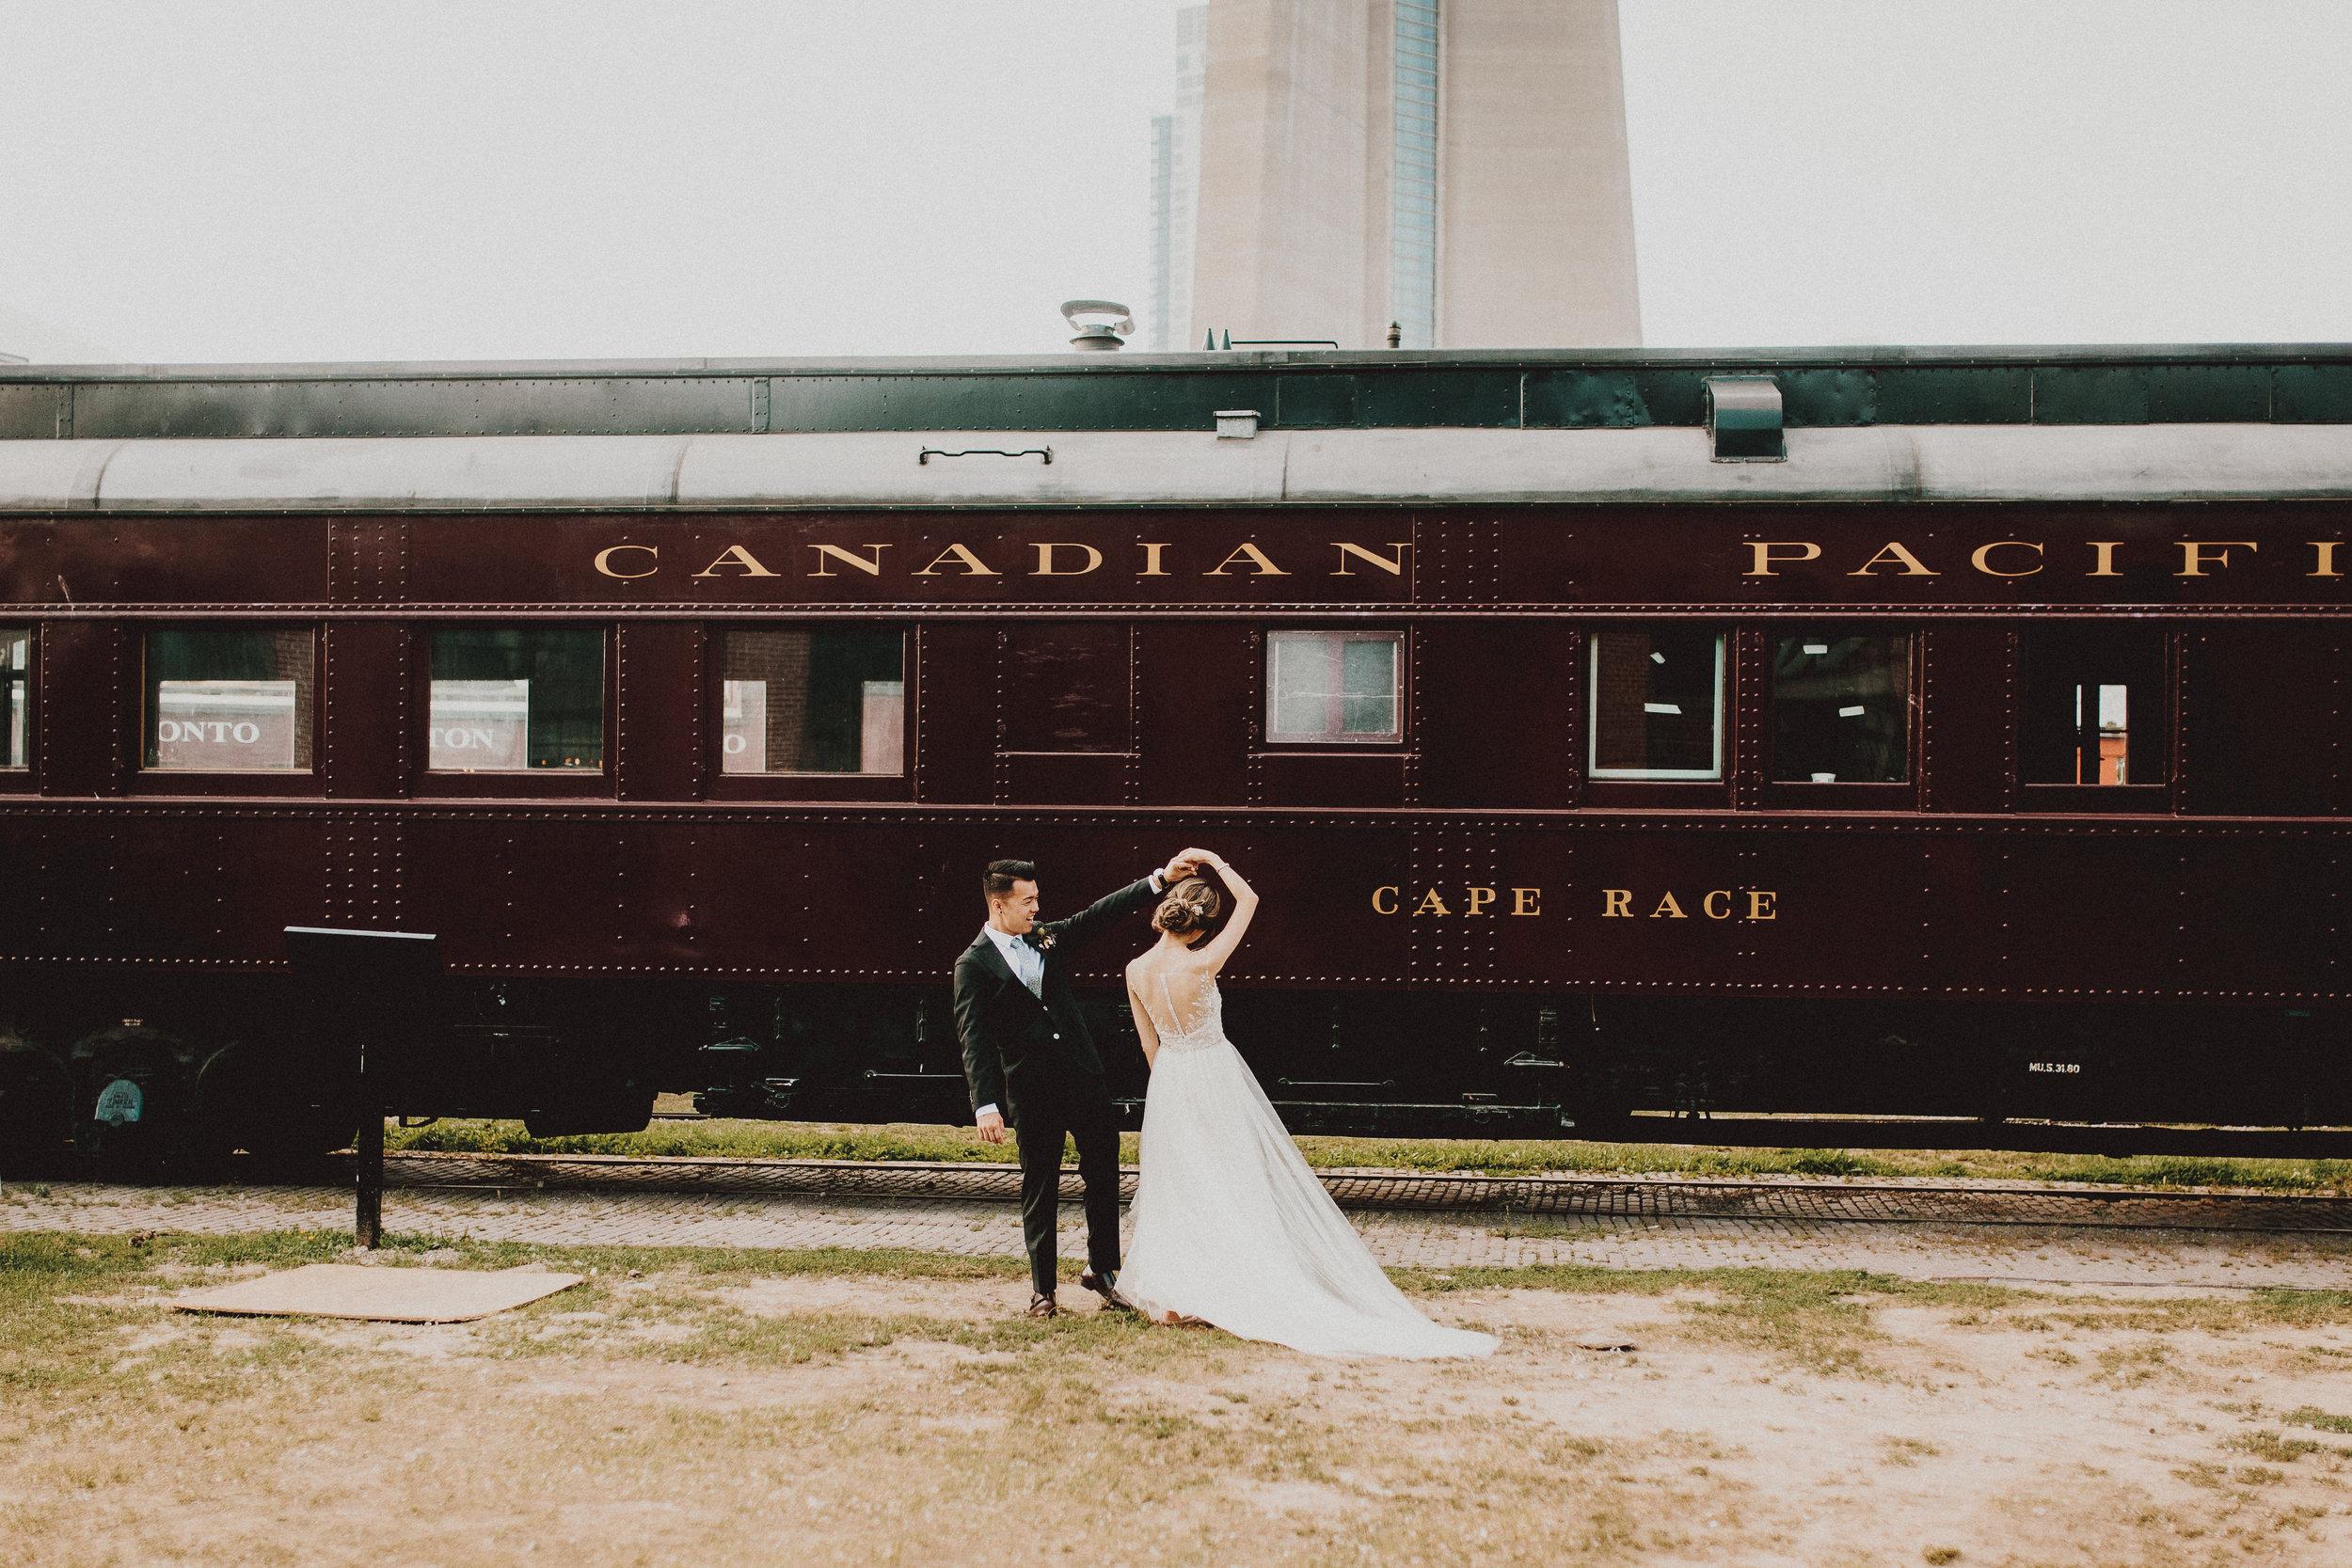 WeddingAlbumEdits-29.jpg